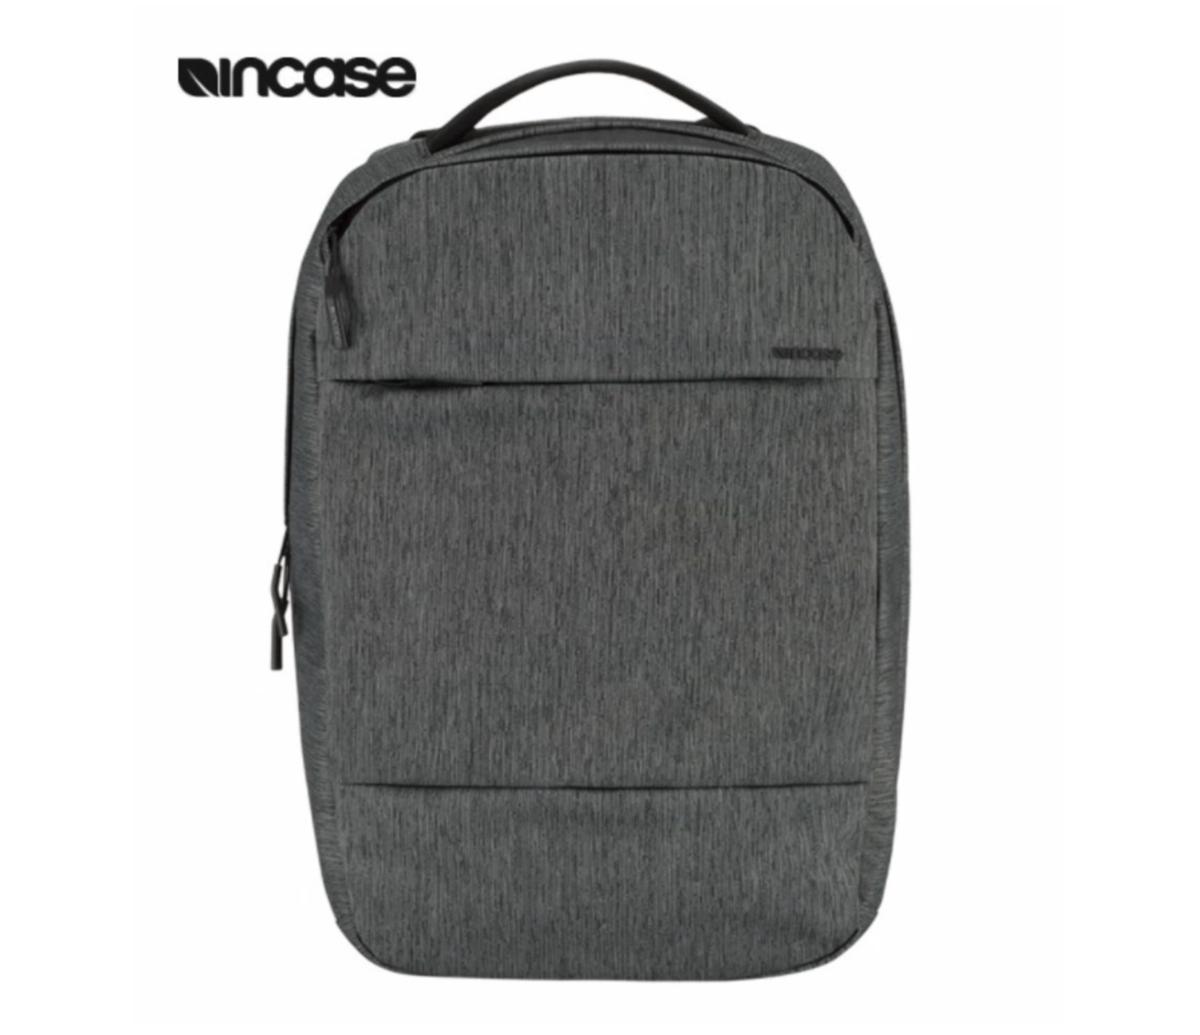 f:id:thebackpack:20190822182357p:plain